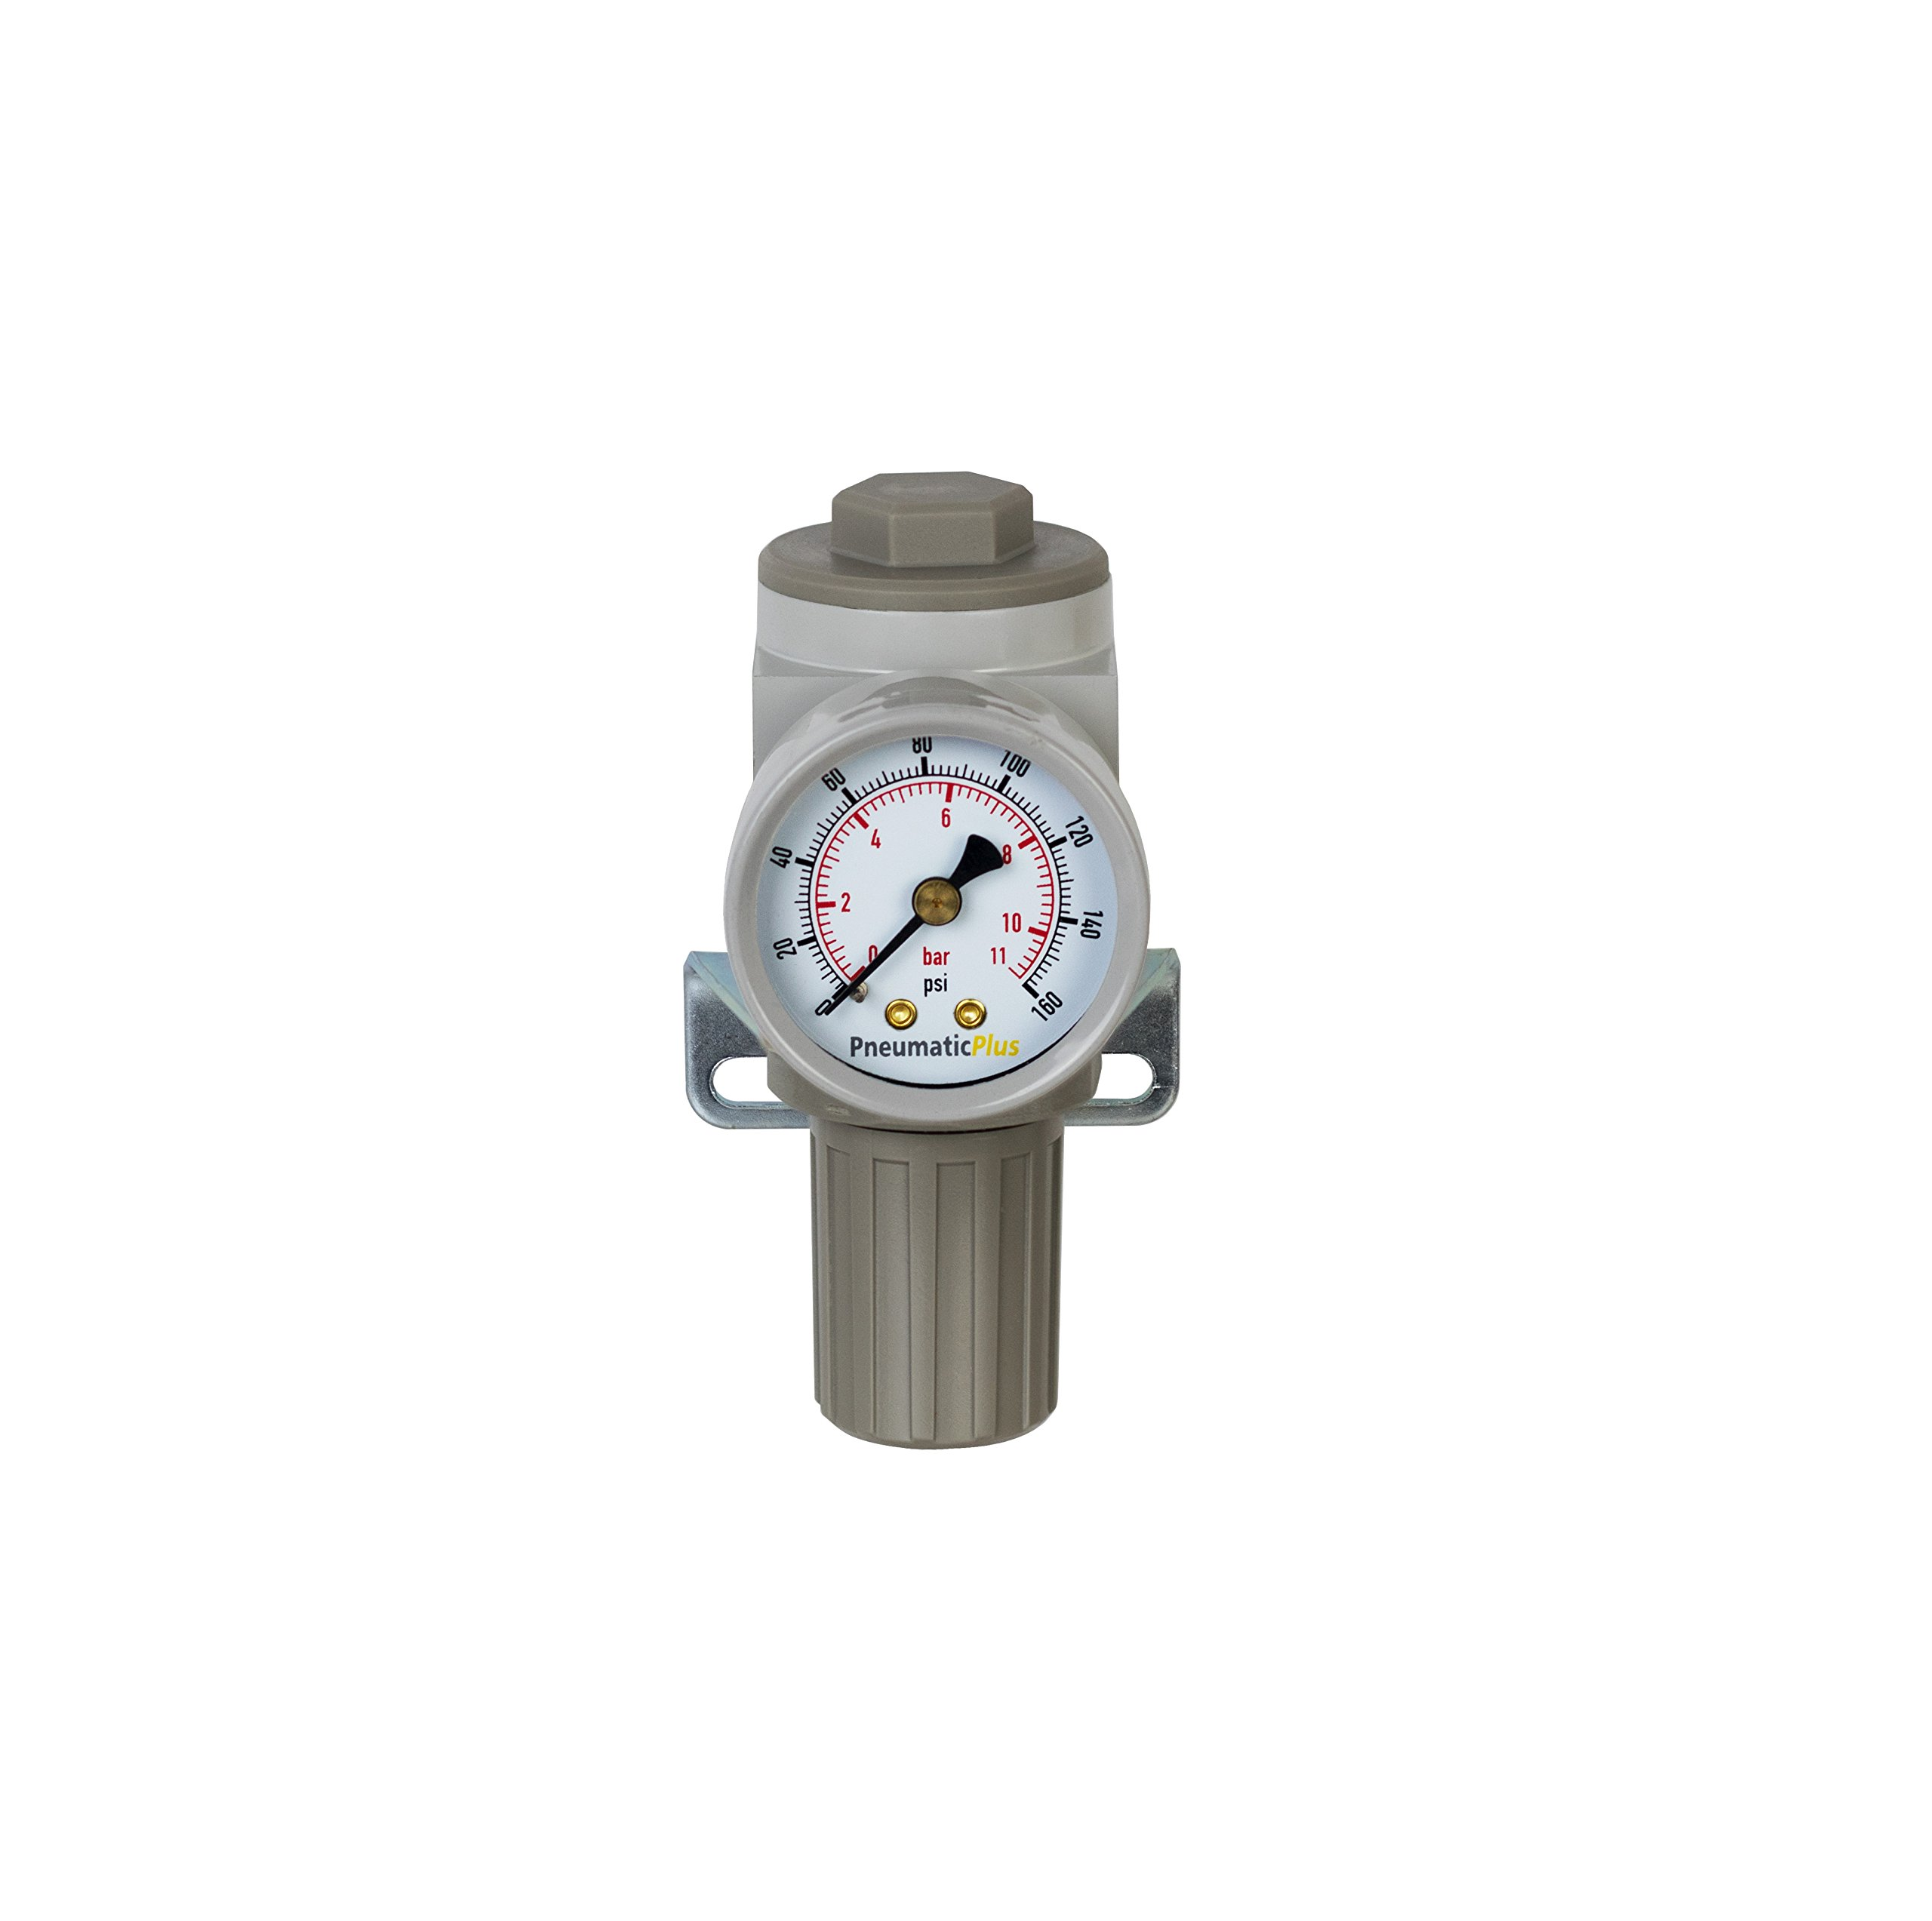 PneumaticPlus SAR2000M-N02BG Miniature Air Pressure Regulator 1/4'' NPT - Gauge, Bracket by PneumaticPlus (Image #5)